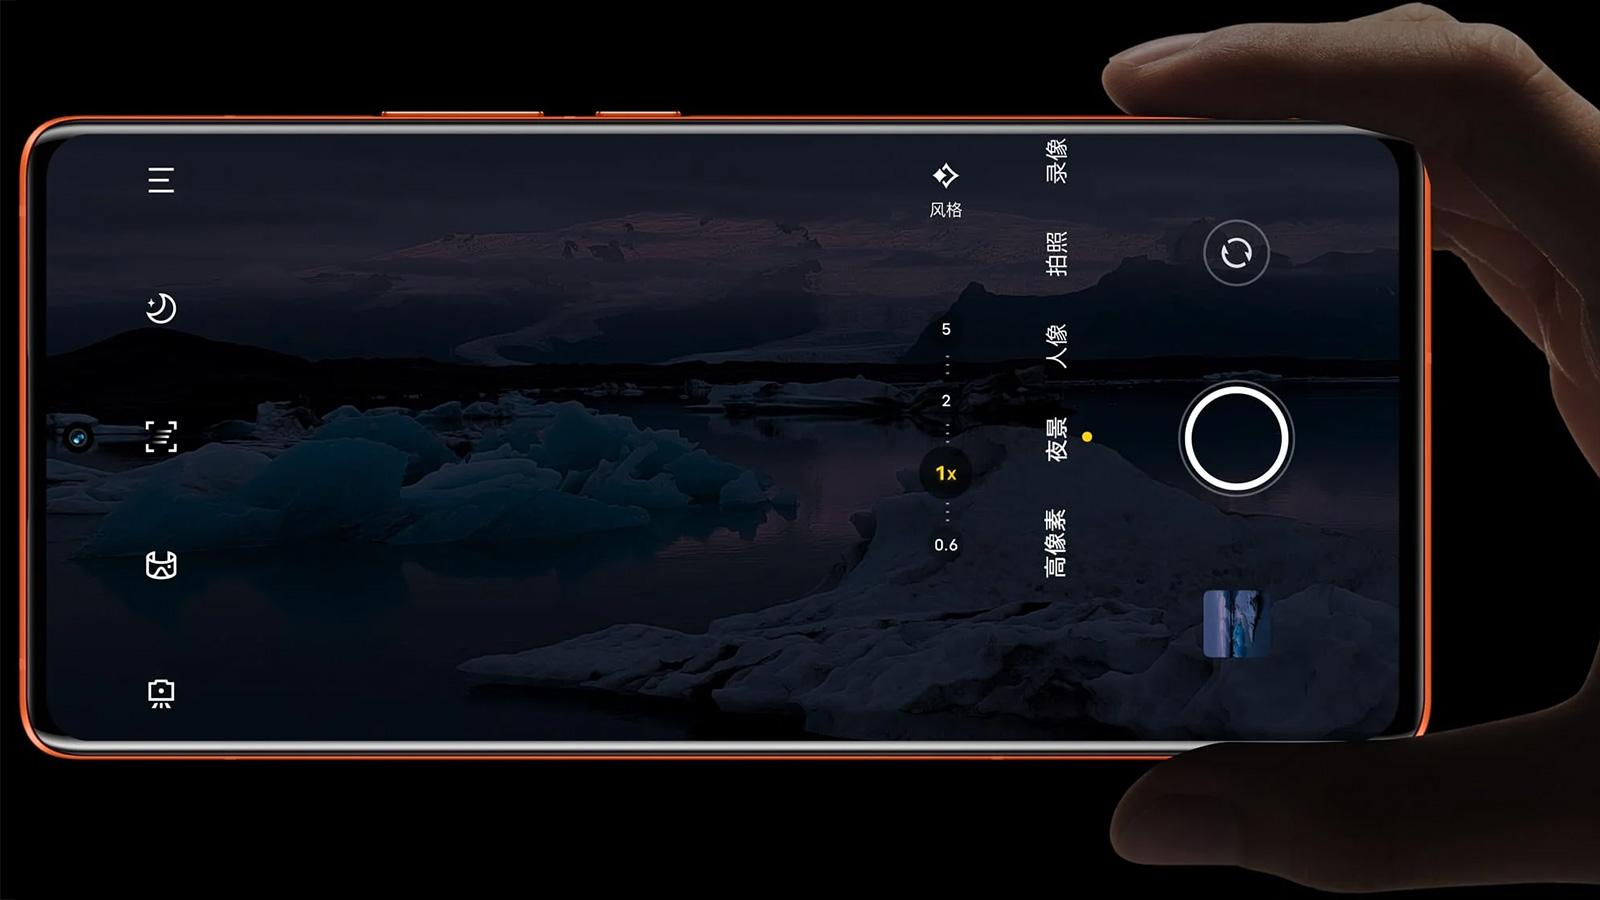 Vivo X70 Pro+ camera app